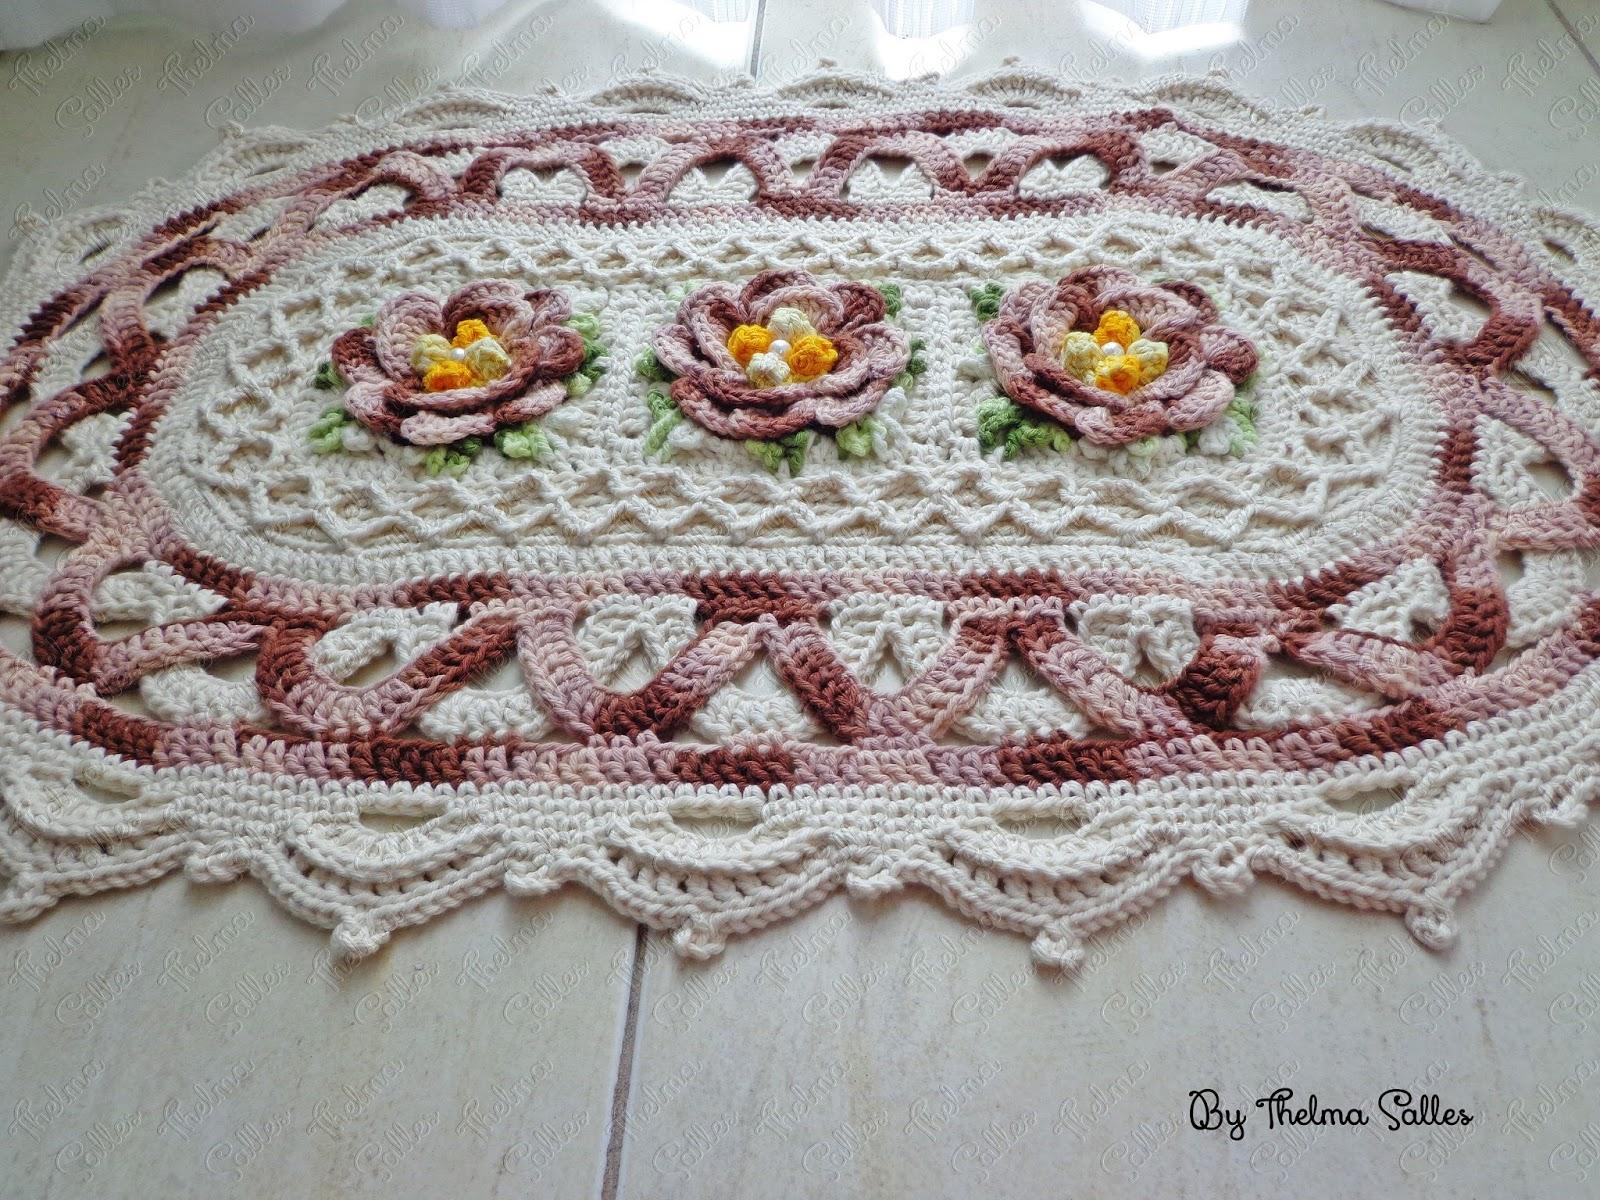 thelma salles artesanatos tapete oval em croch bordado